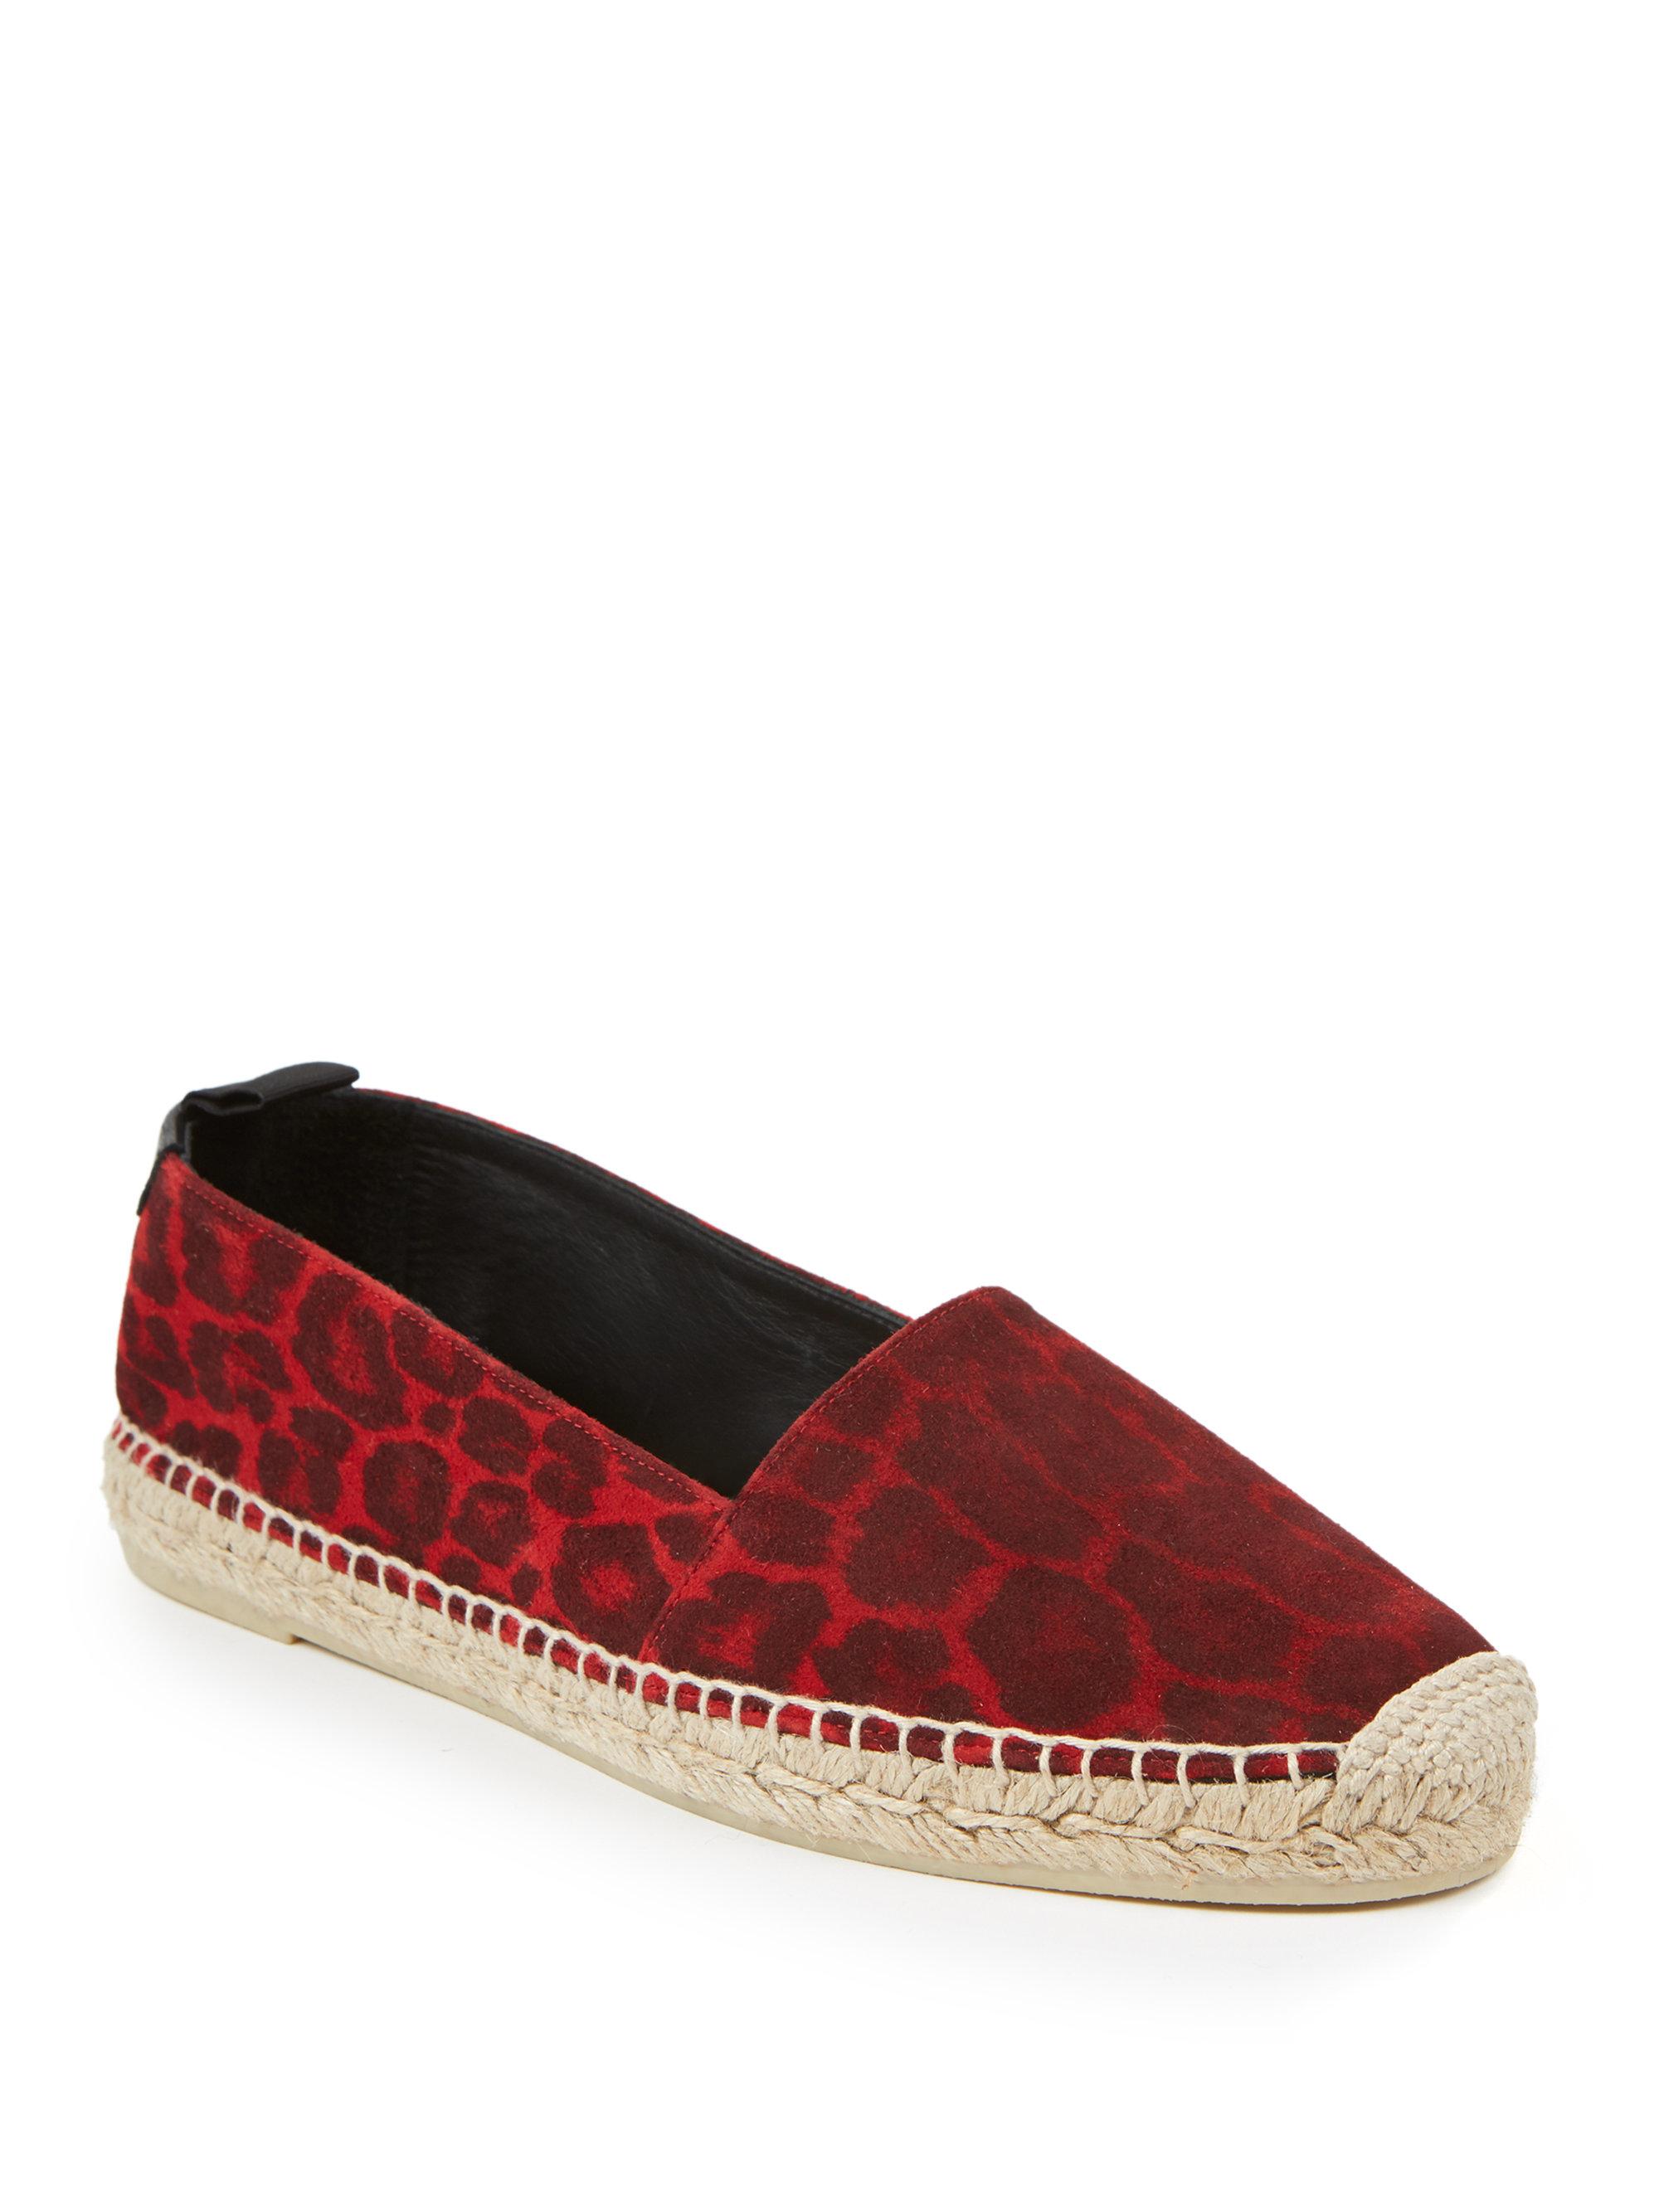 saint laurent leopard print suede espadrilles in red lyst